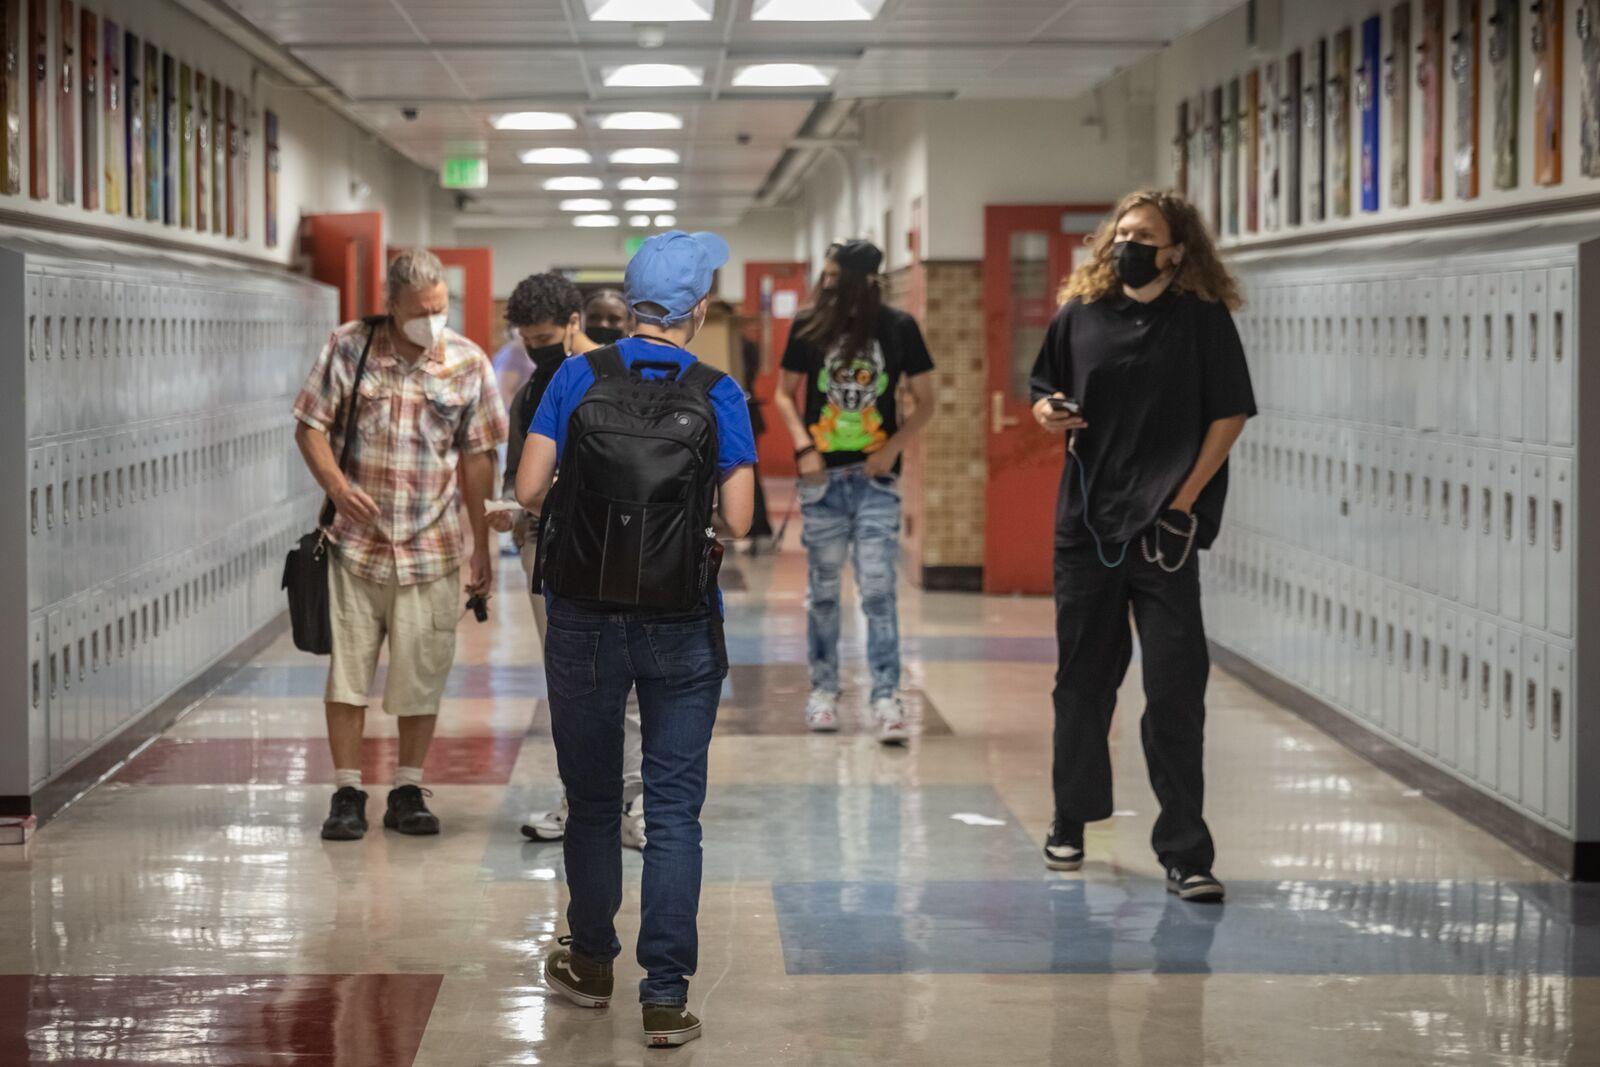 Students in the hallway of Berkeley High School on Aug. 16, 2021. Credit: Kelly Sullivan